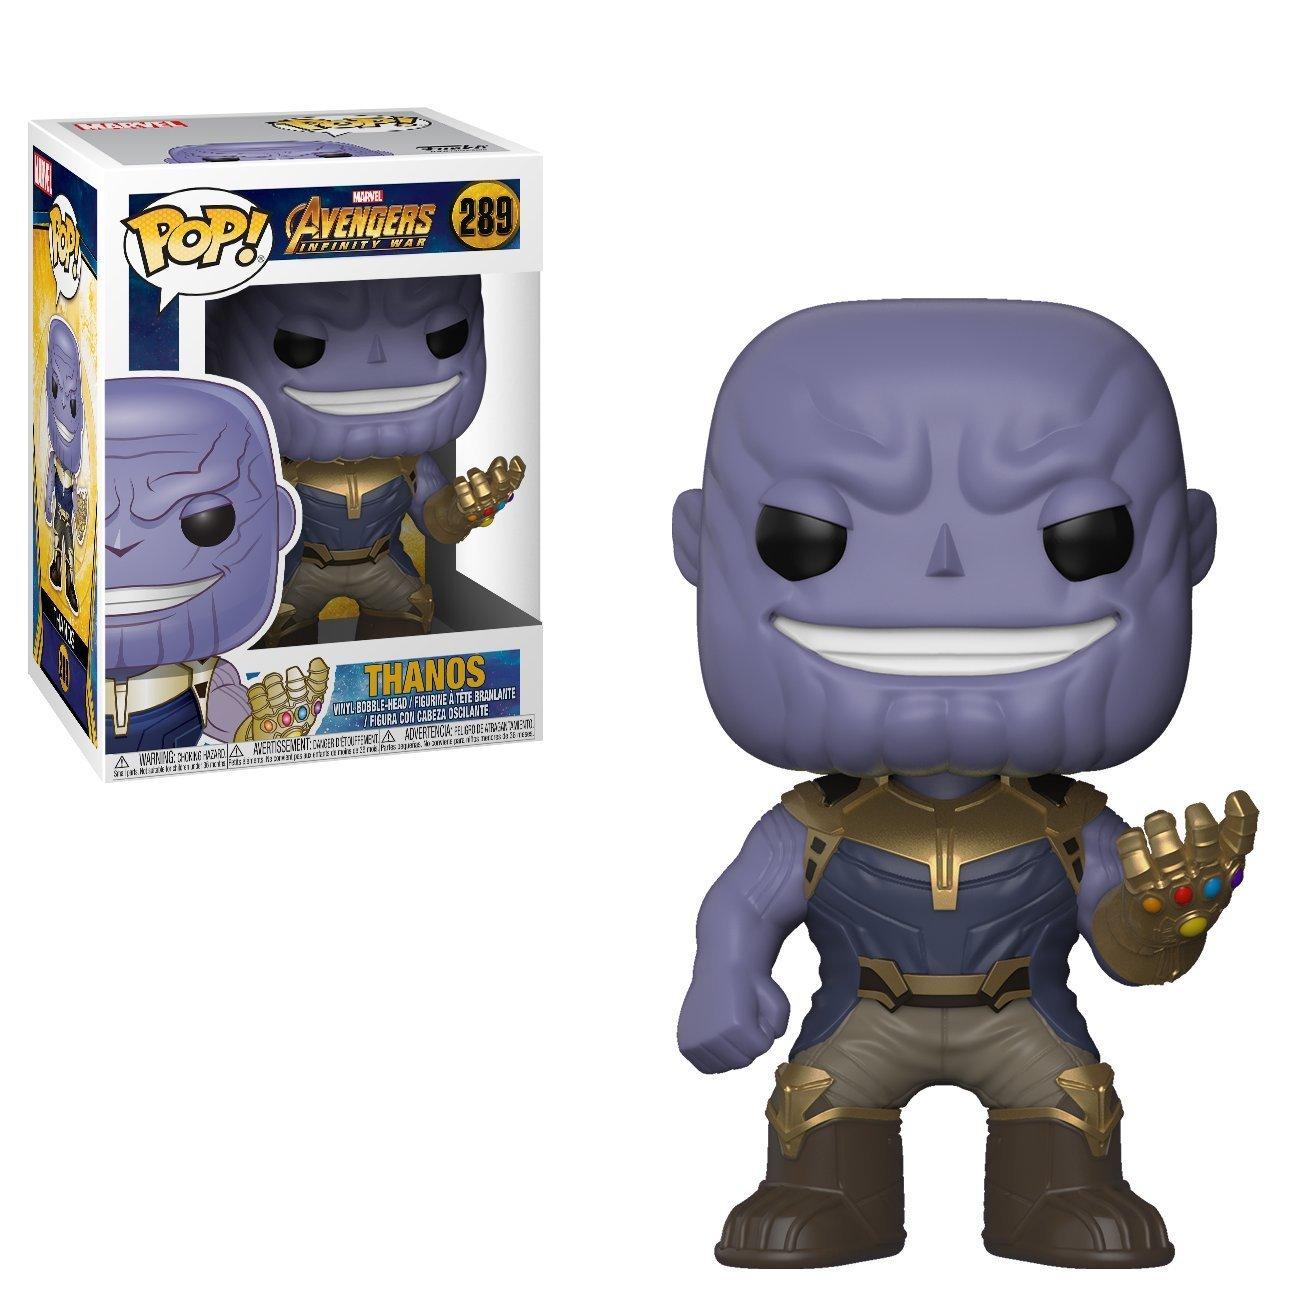 Funko POP! - Marvel: Avengers Infinity War: Thanos imagen